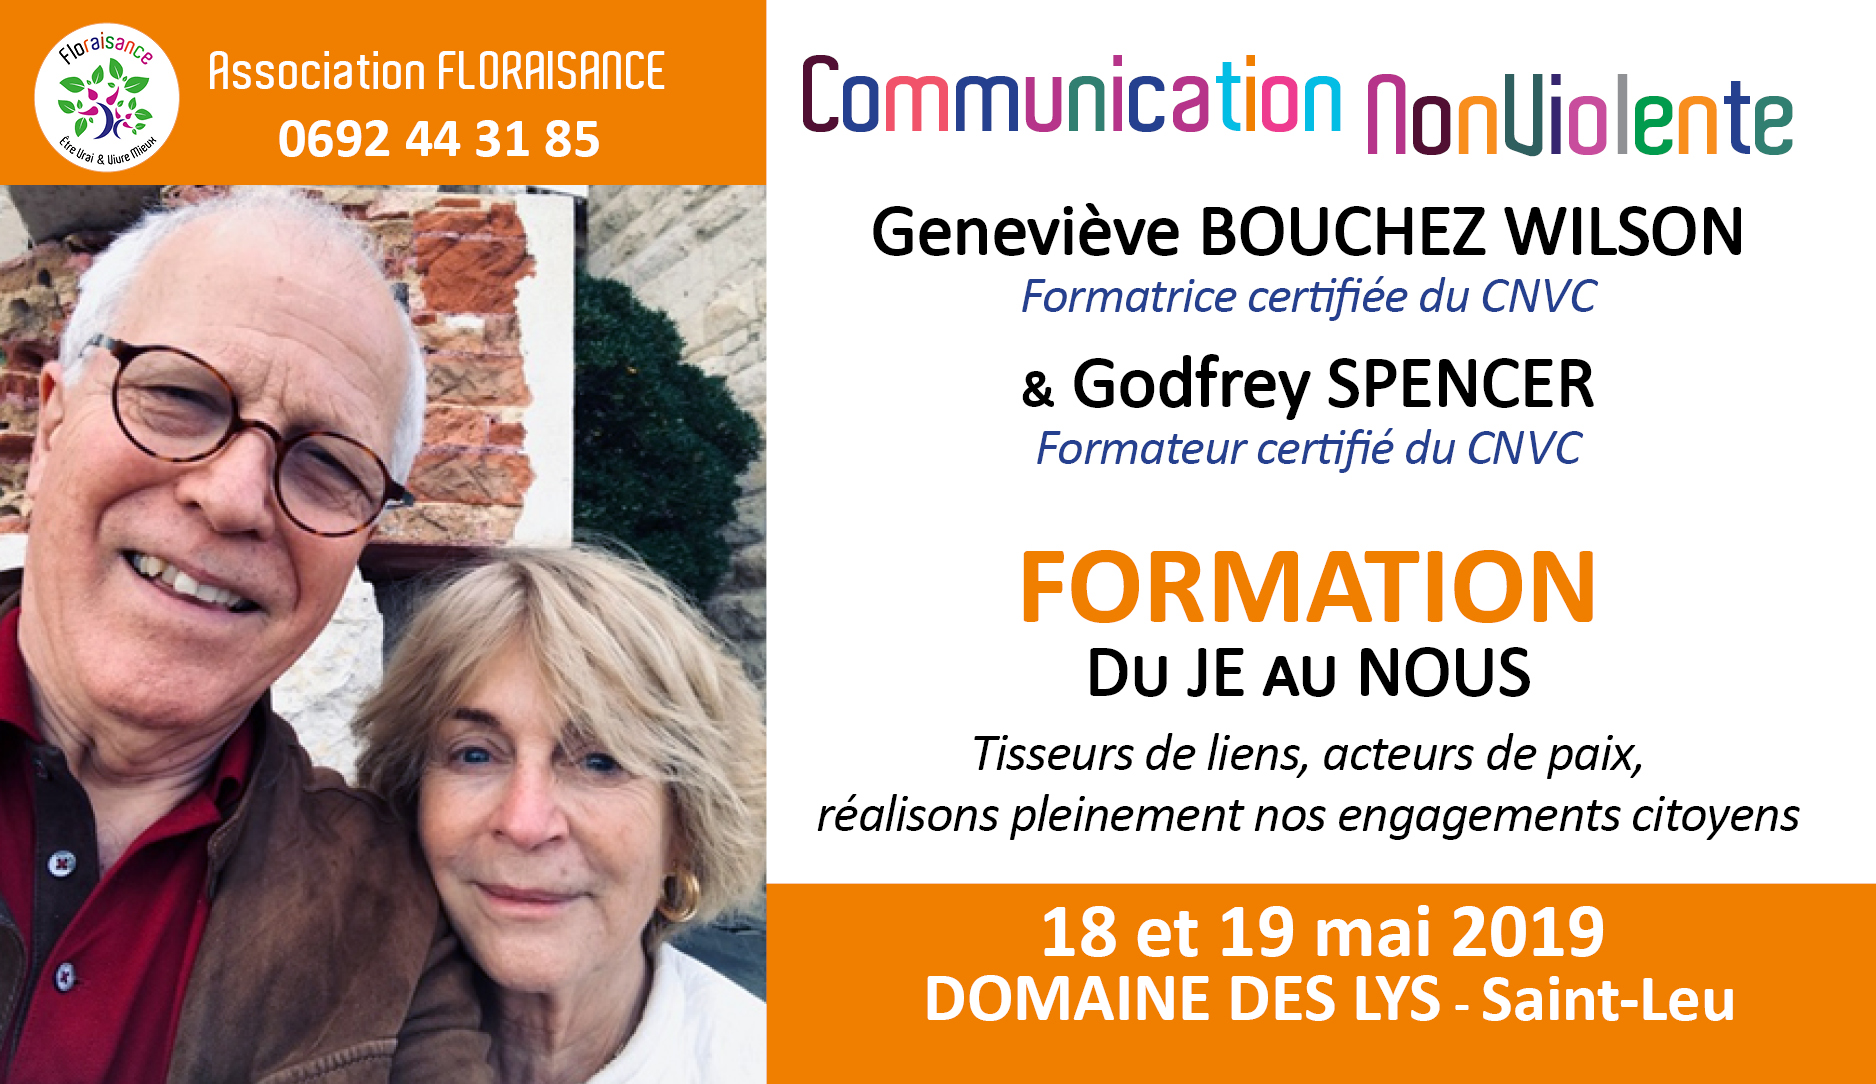 affiche Geneviève et Godfrey - formation 18 19 mai